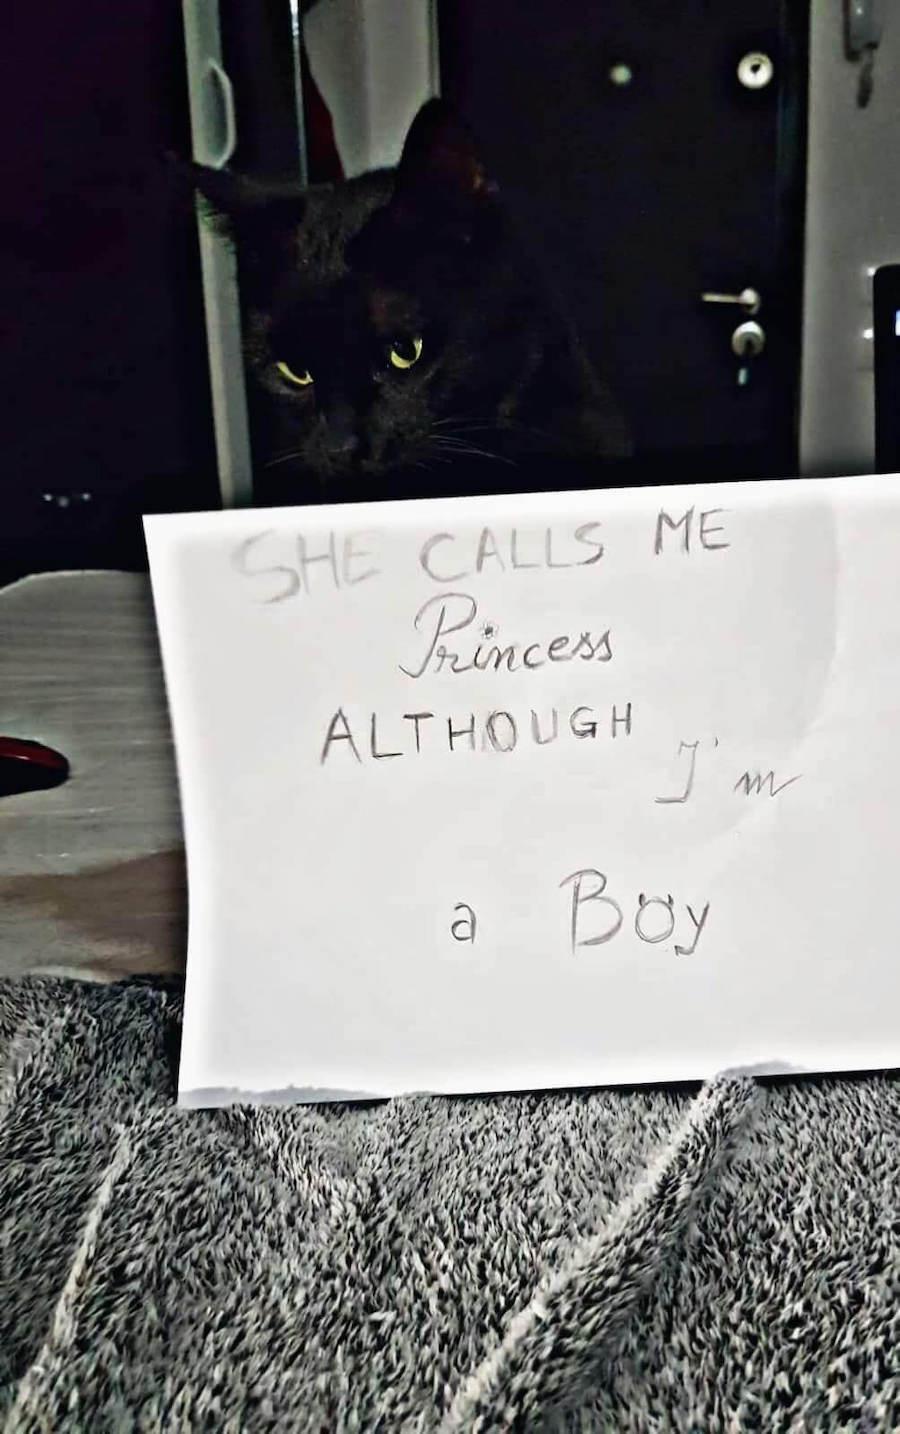 black cat next to paper